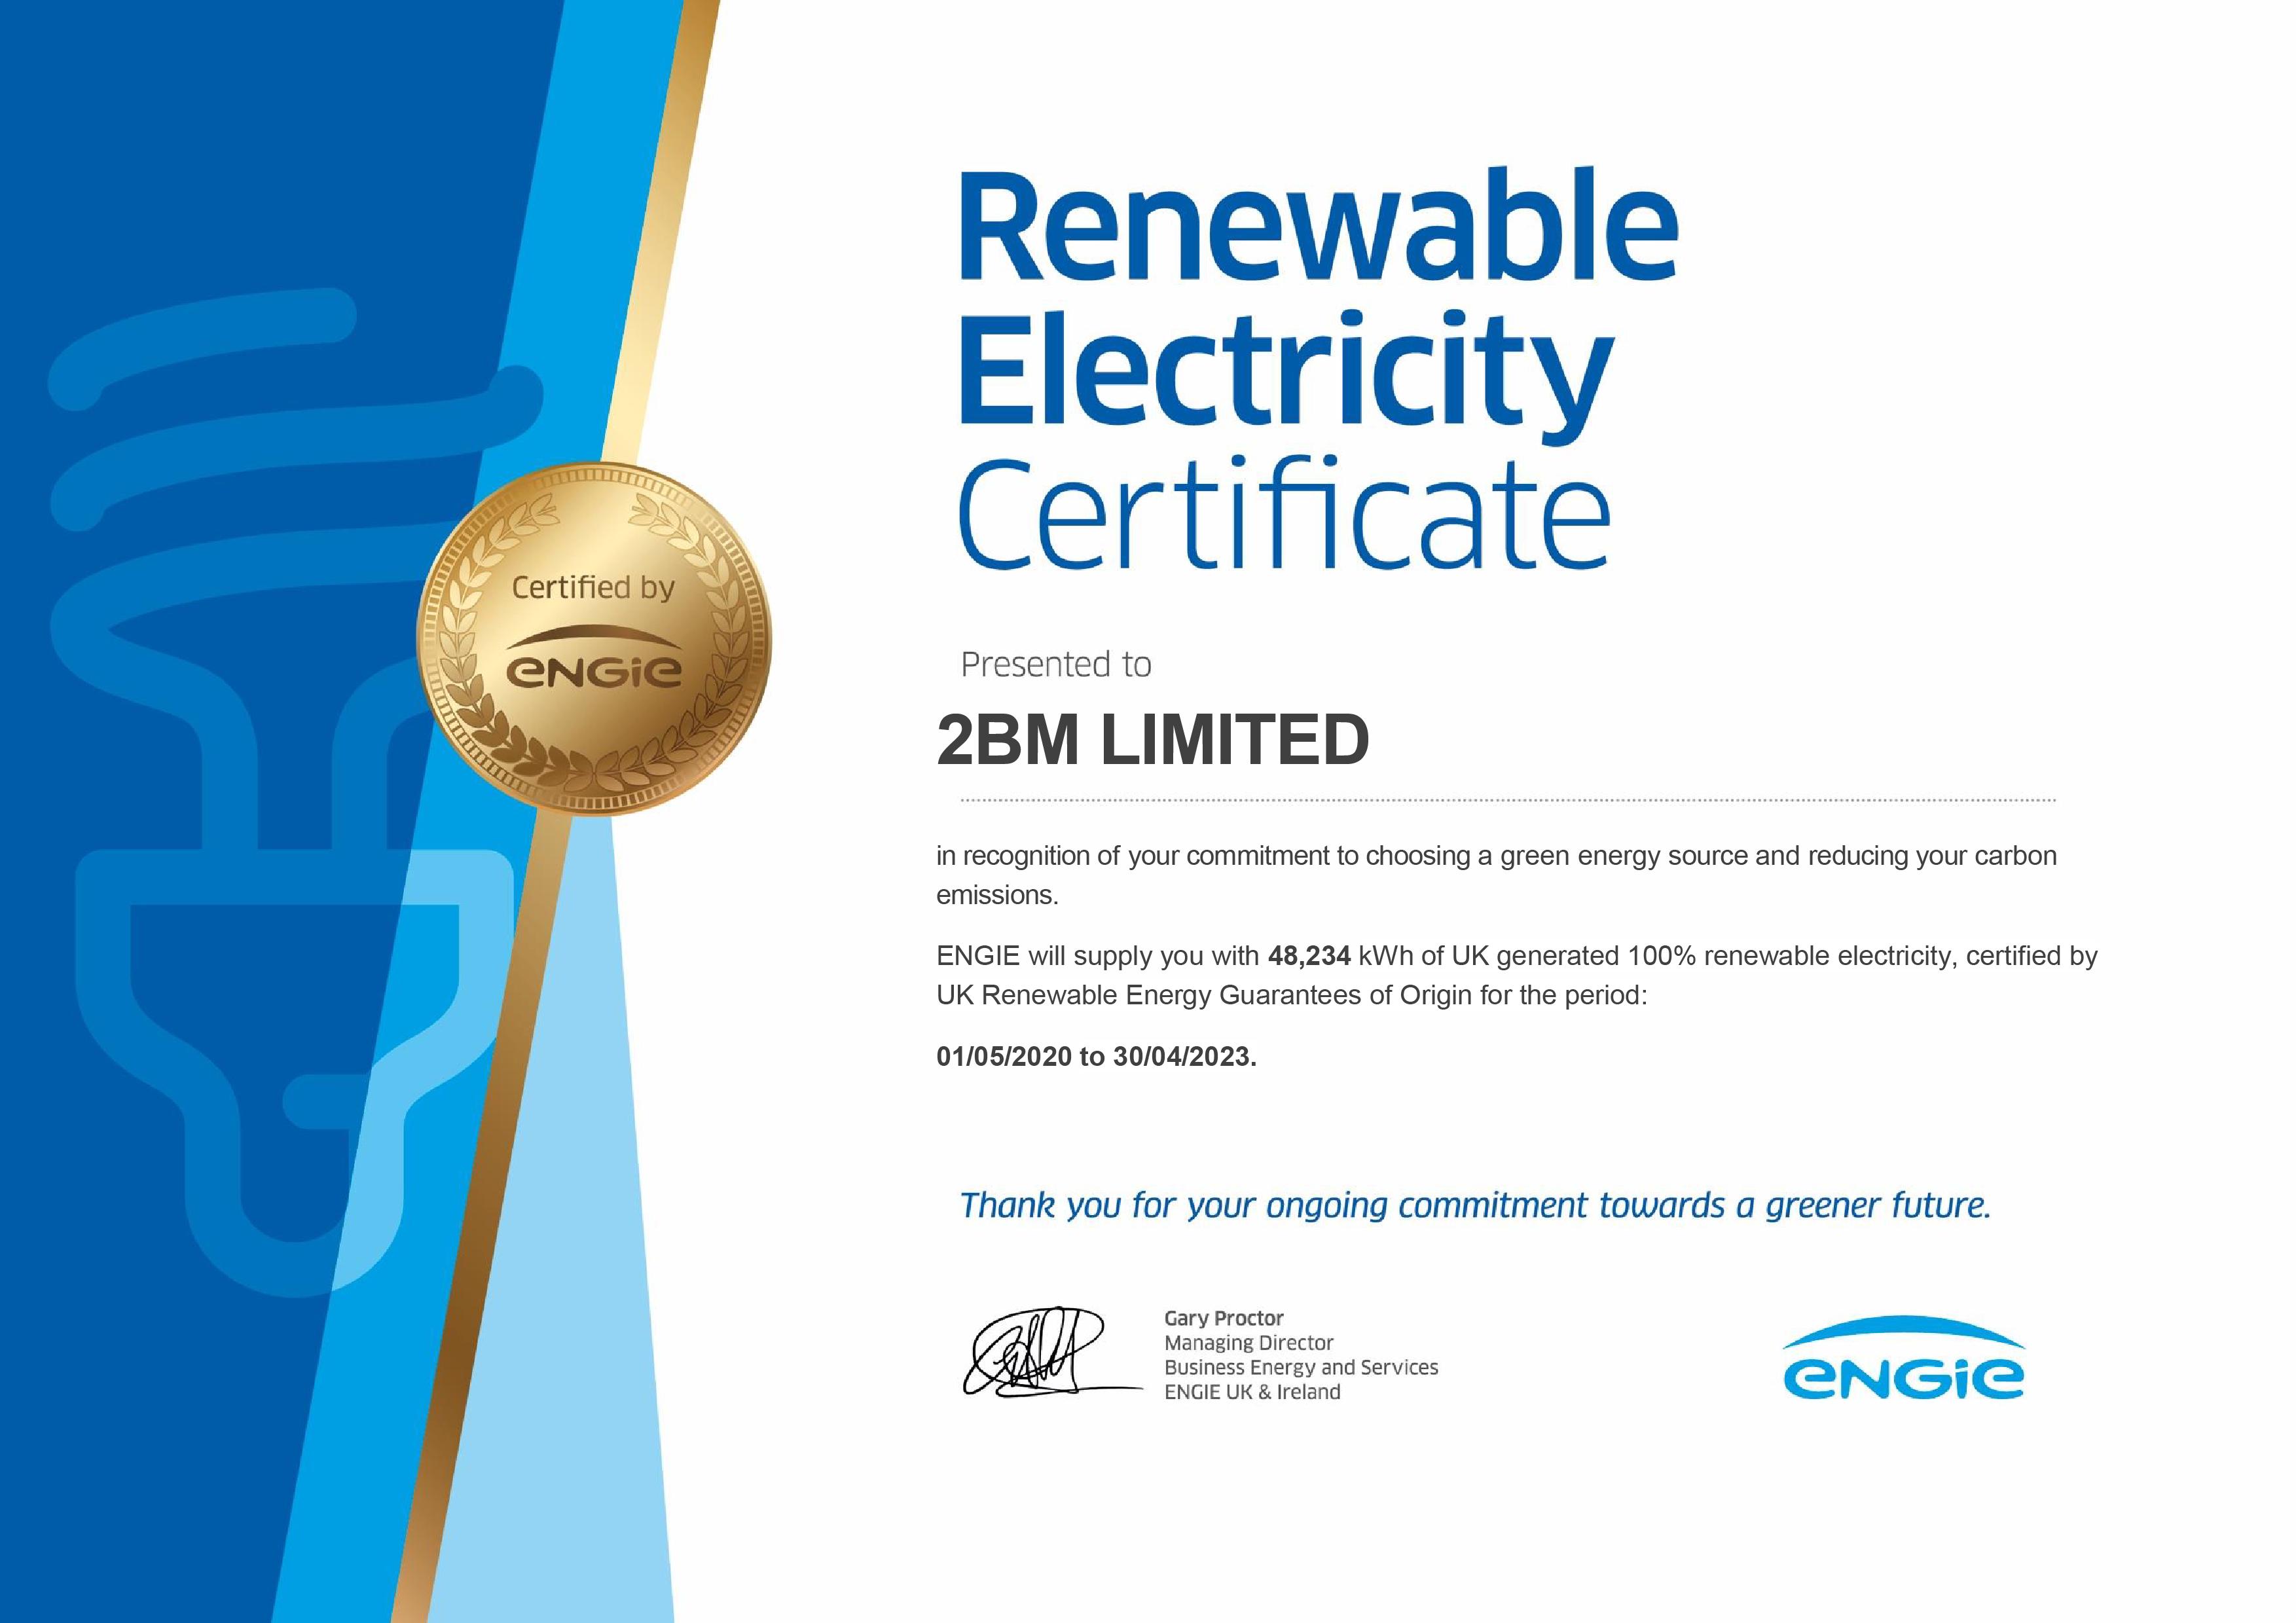 2bm_renewable_electricity_certificate